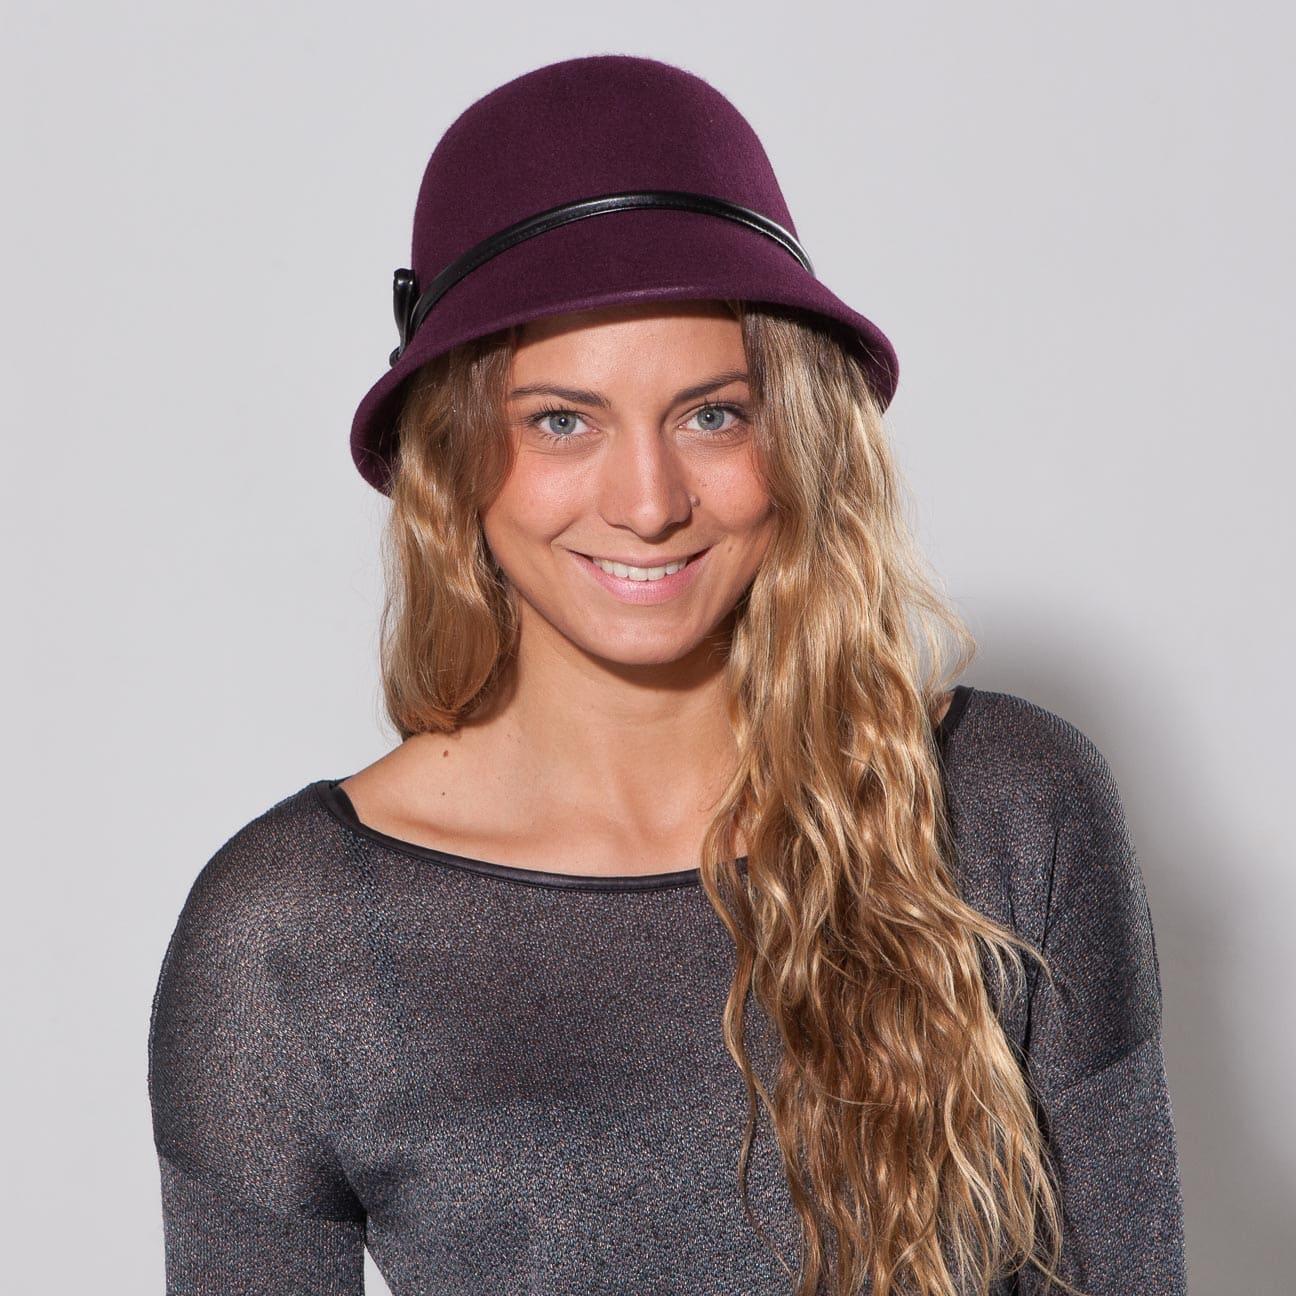 ... Christina Wool Felt Cloche Hat by Betmar 1 ... 3c7f46d4272